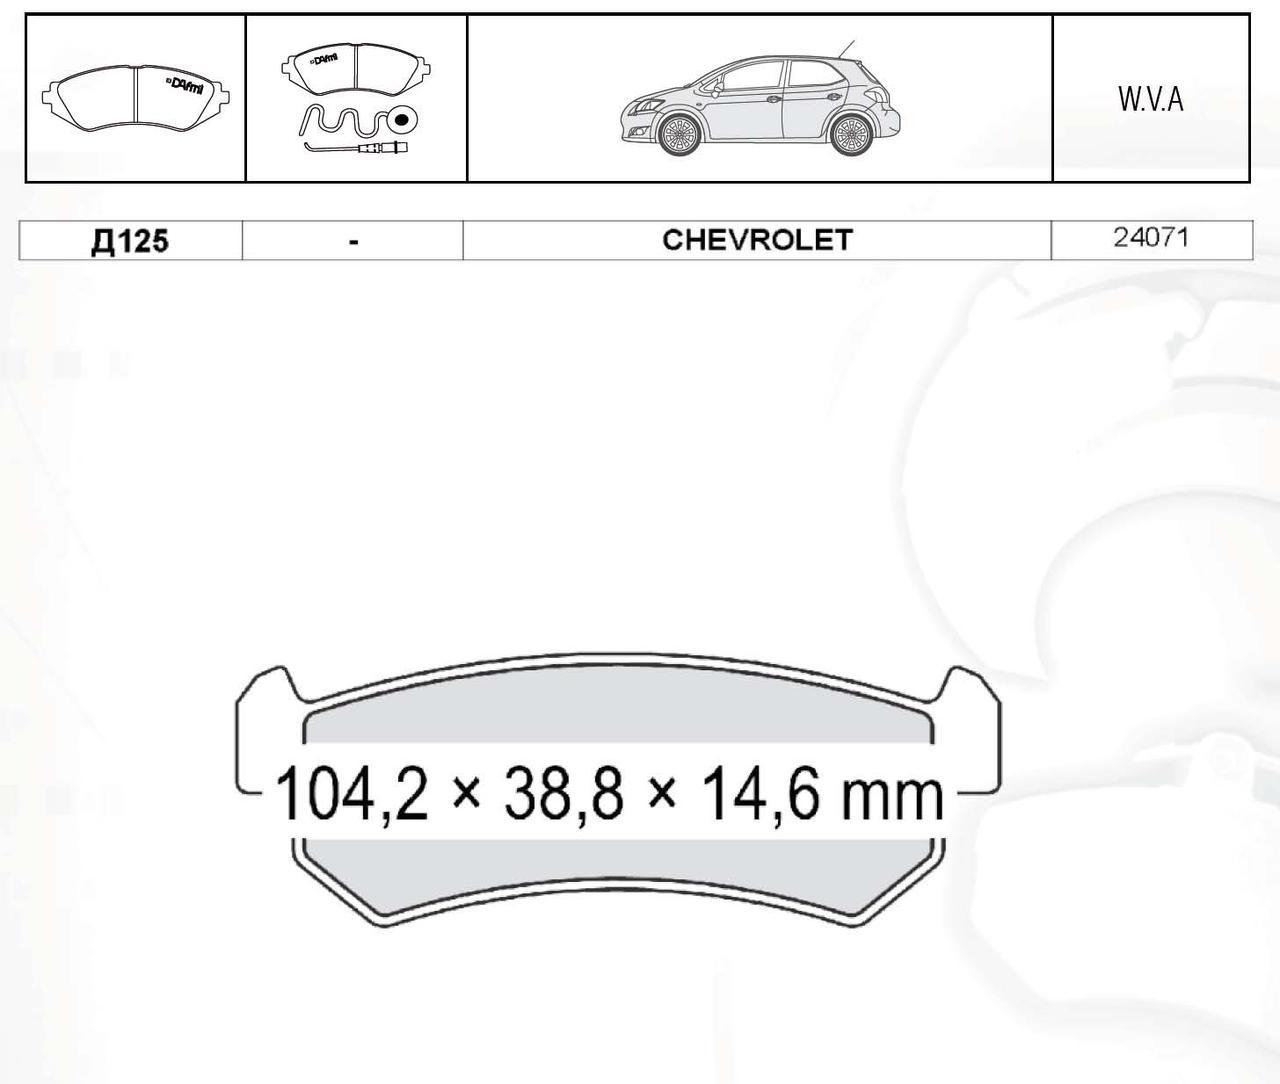 Intelli d125e гальмівні колодки (задні) CHEVROLET AVEO, CHEVROLET NUBIRA, DAEWOO LACETTI